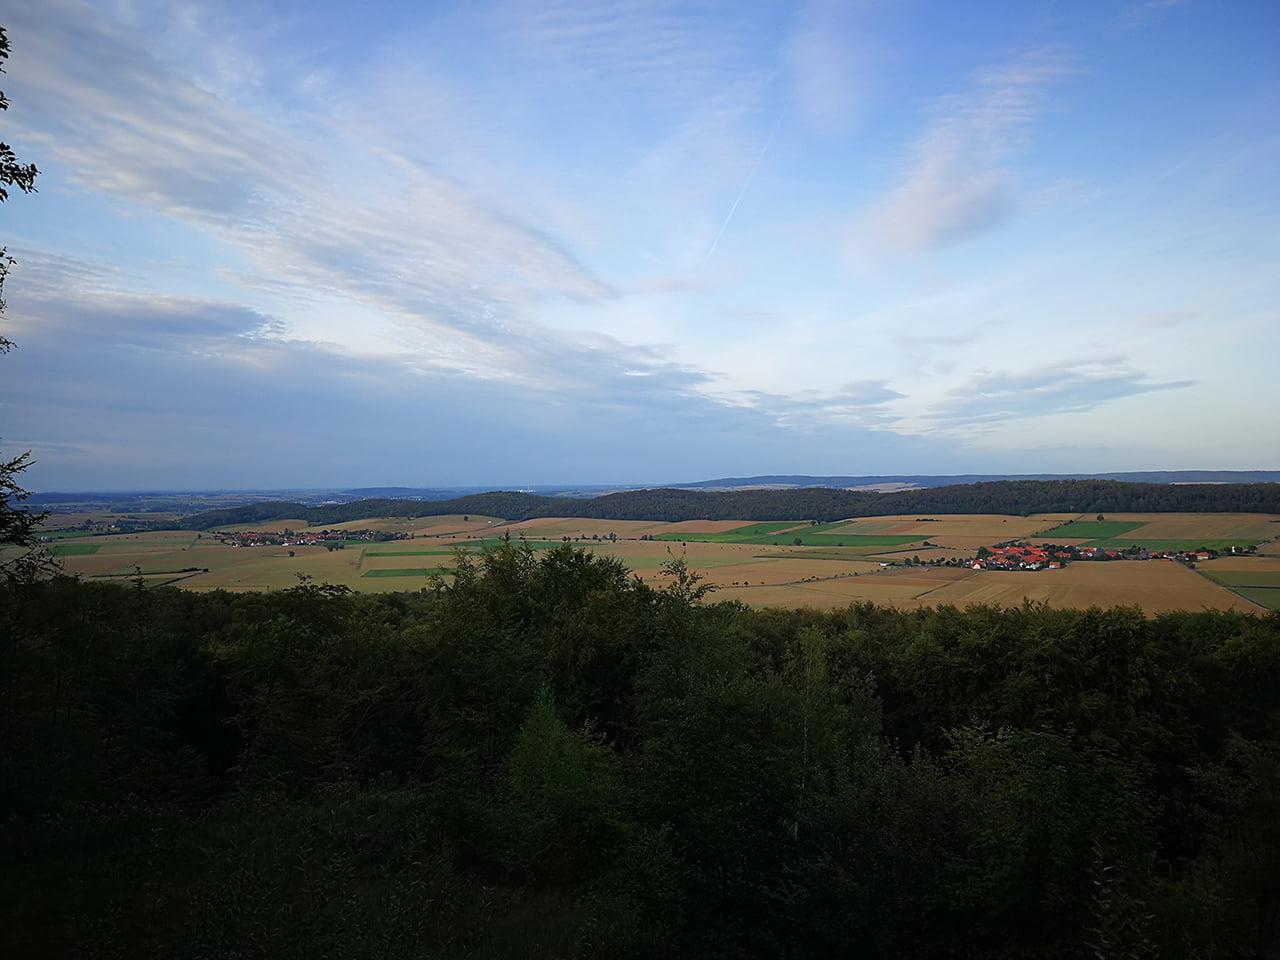 Leineberglandbalkon